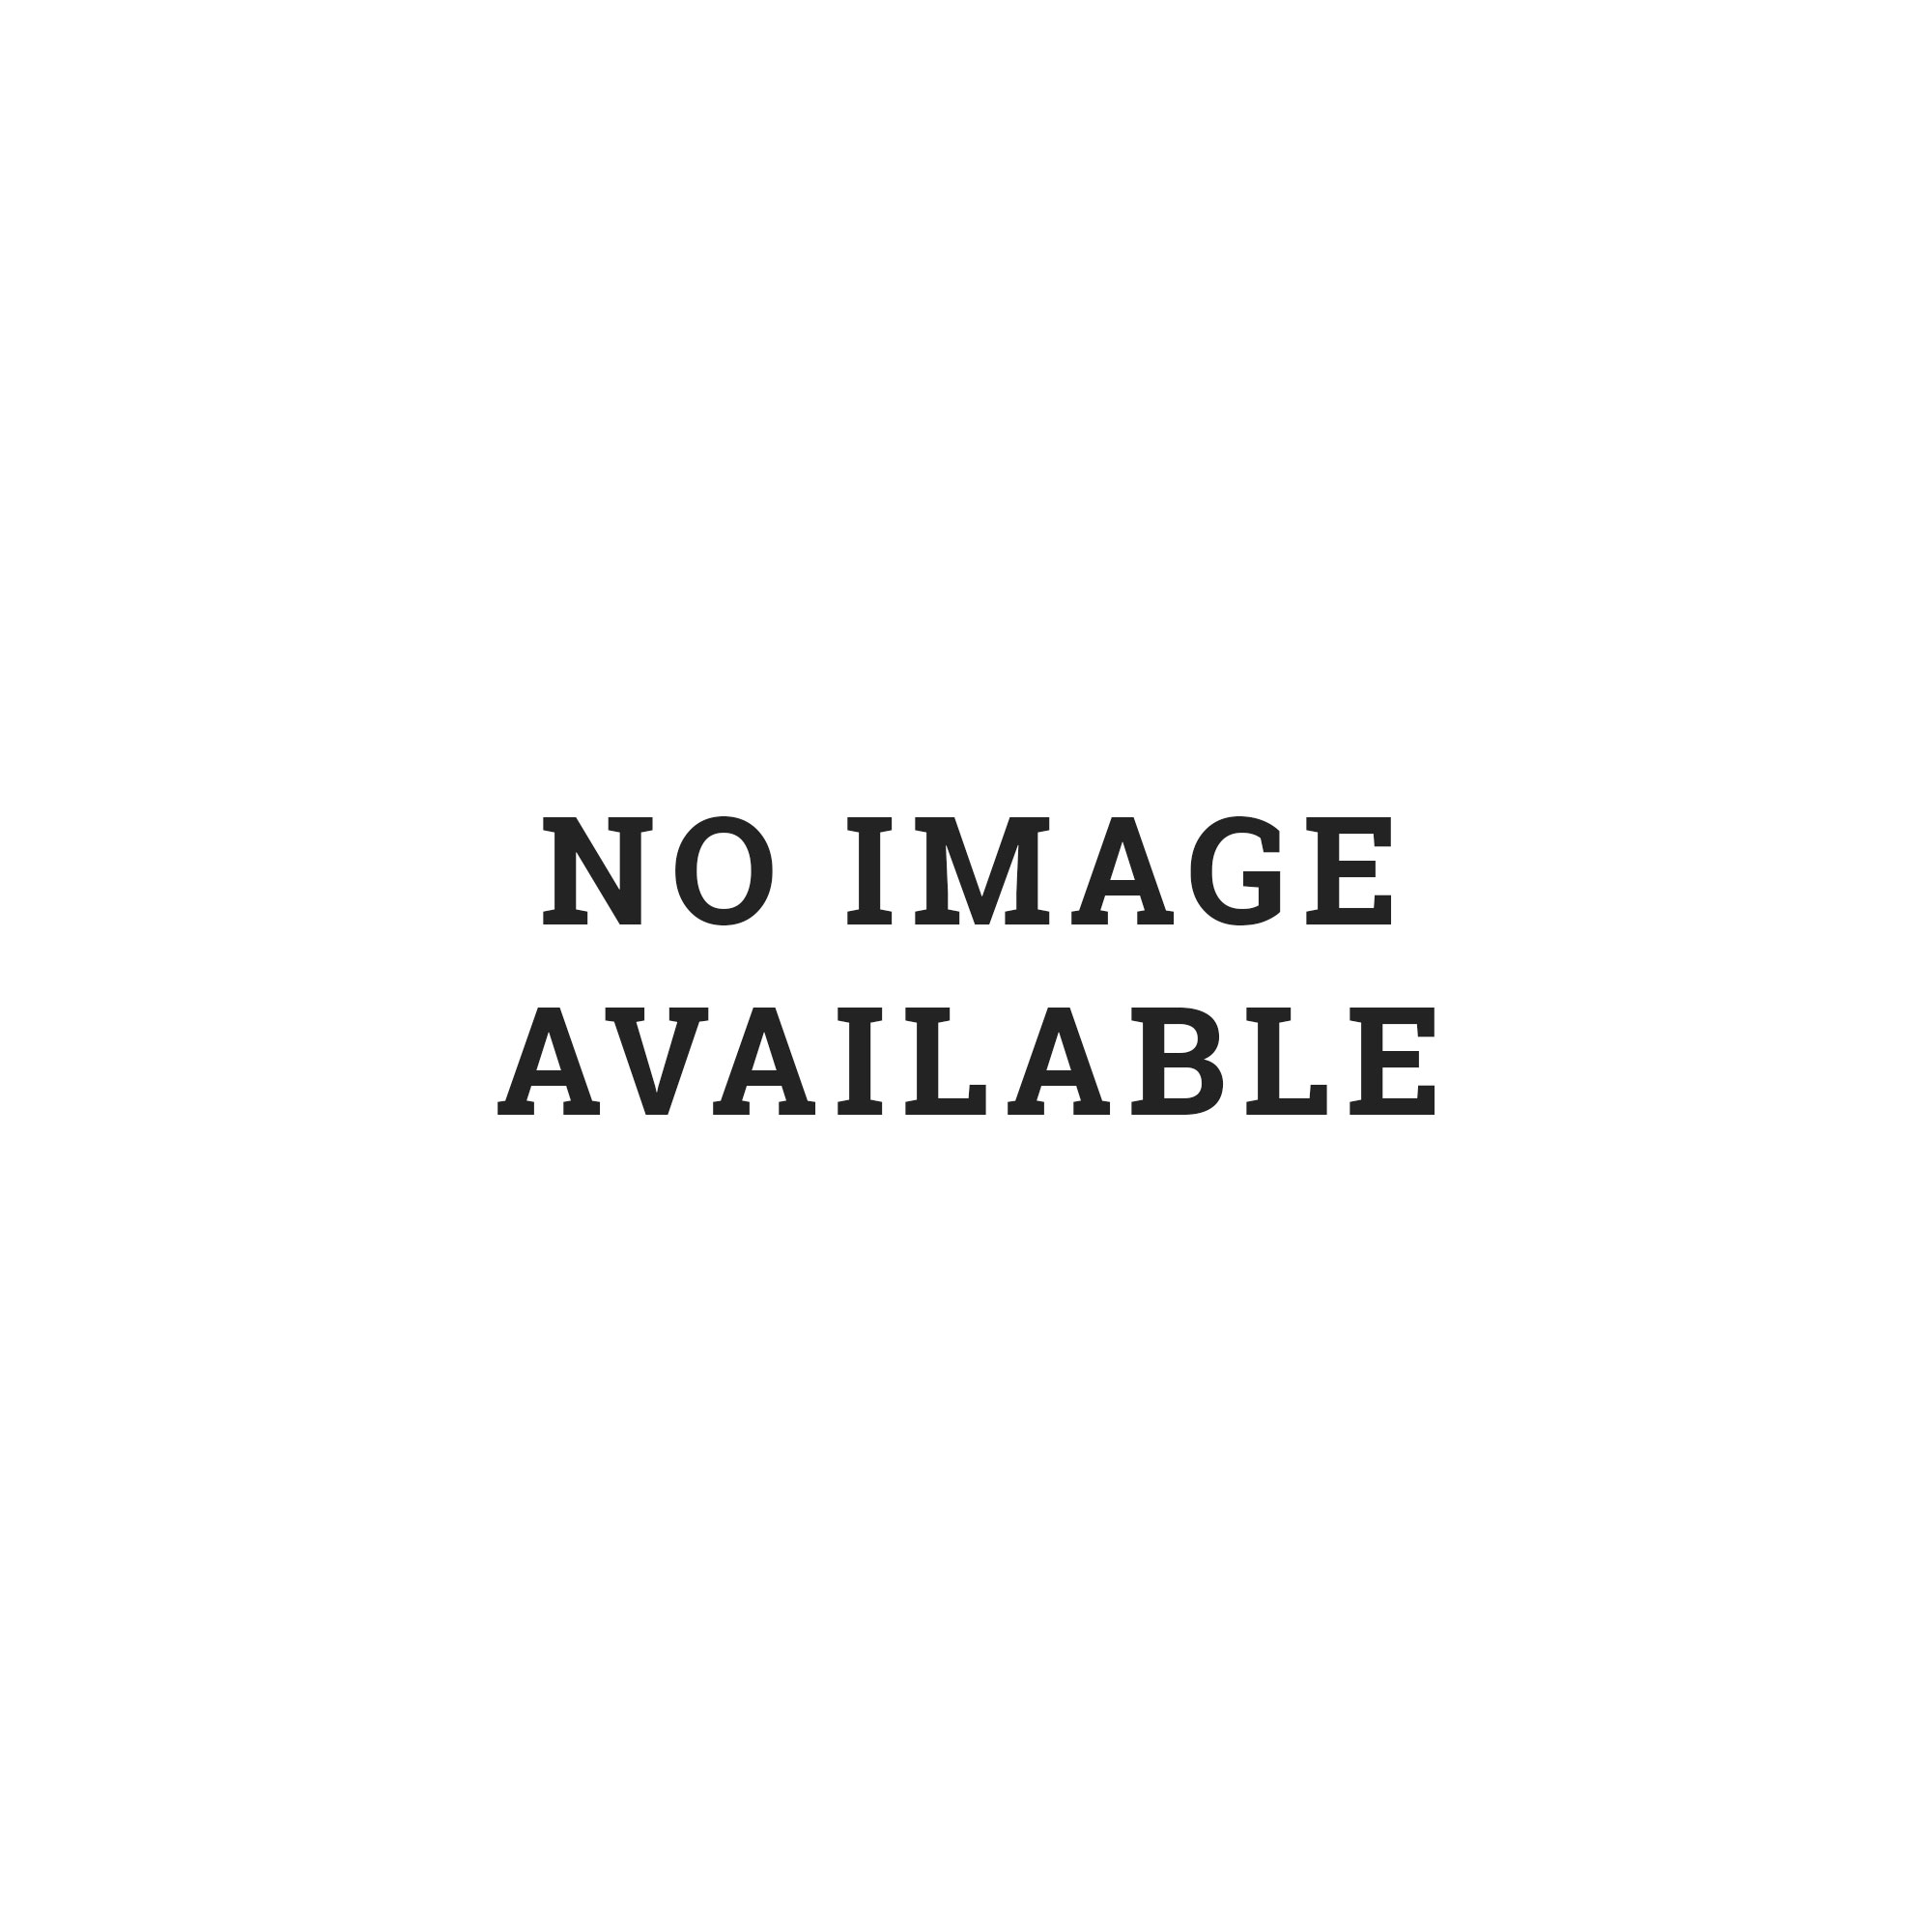 Converse 151112C Chuck Taylor Leather Unisex Hi Top Basketball Boots - Black